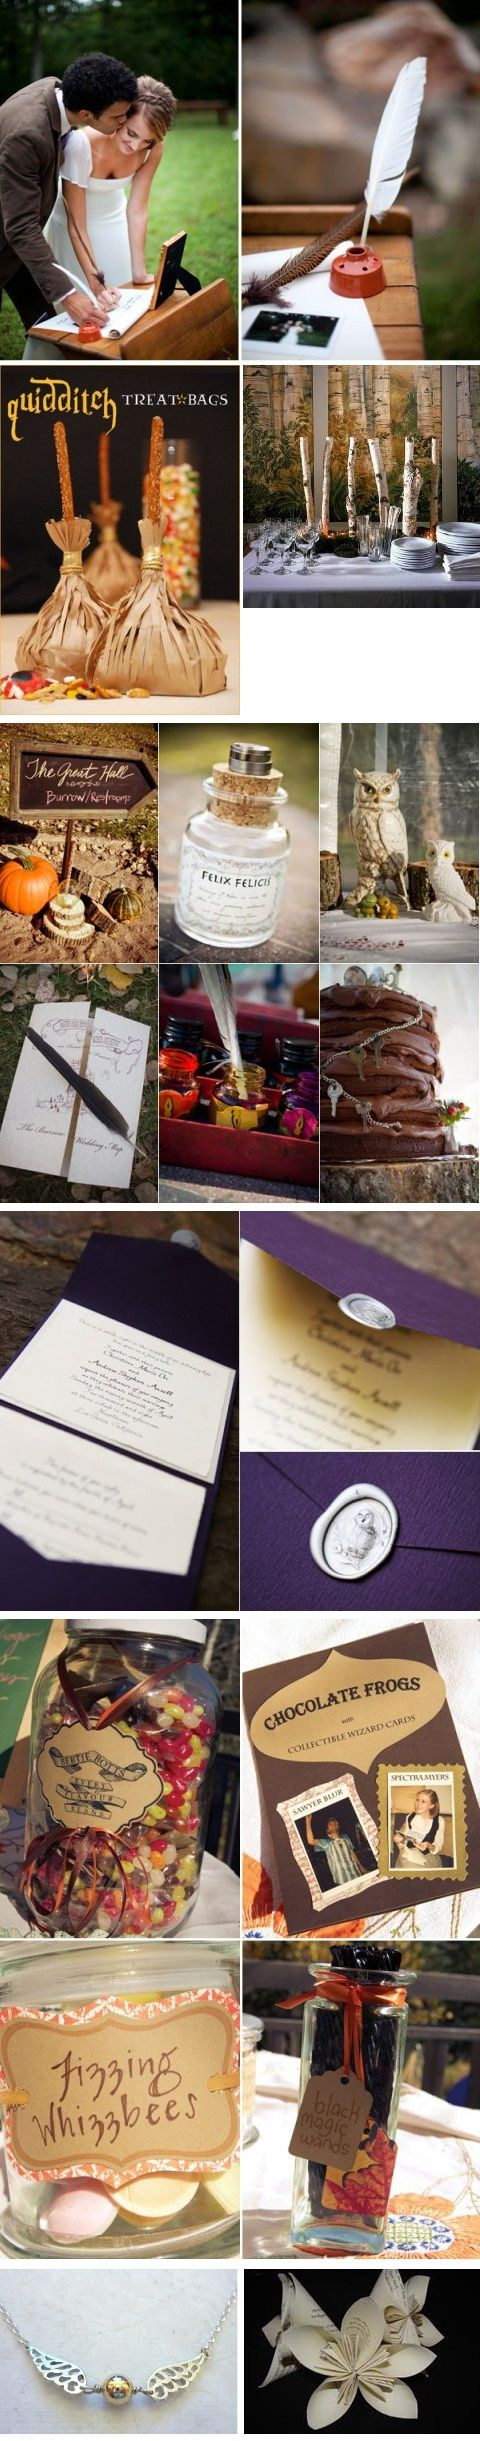 harry potter engagement harry potter wedding bands Harry Potter Wedding Wedding Ideas Top Wedding Blog s Wedding Trends David